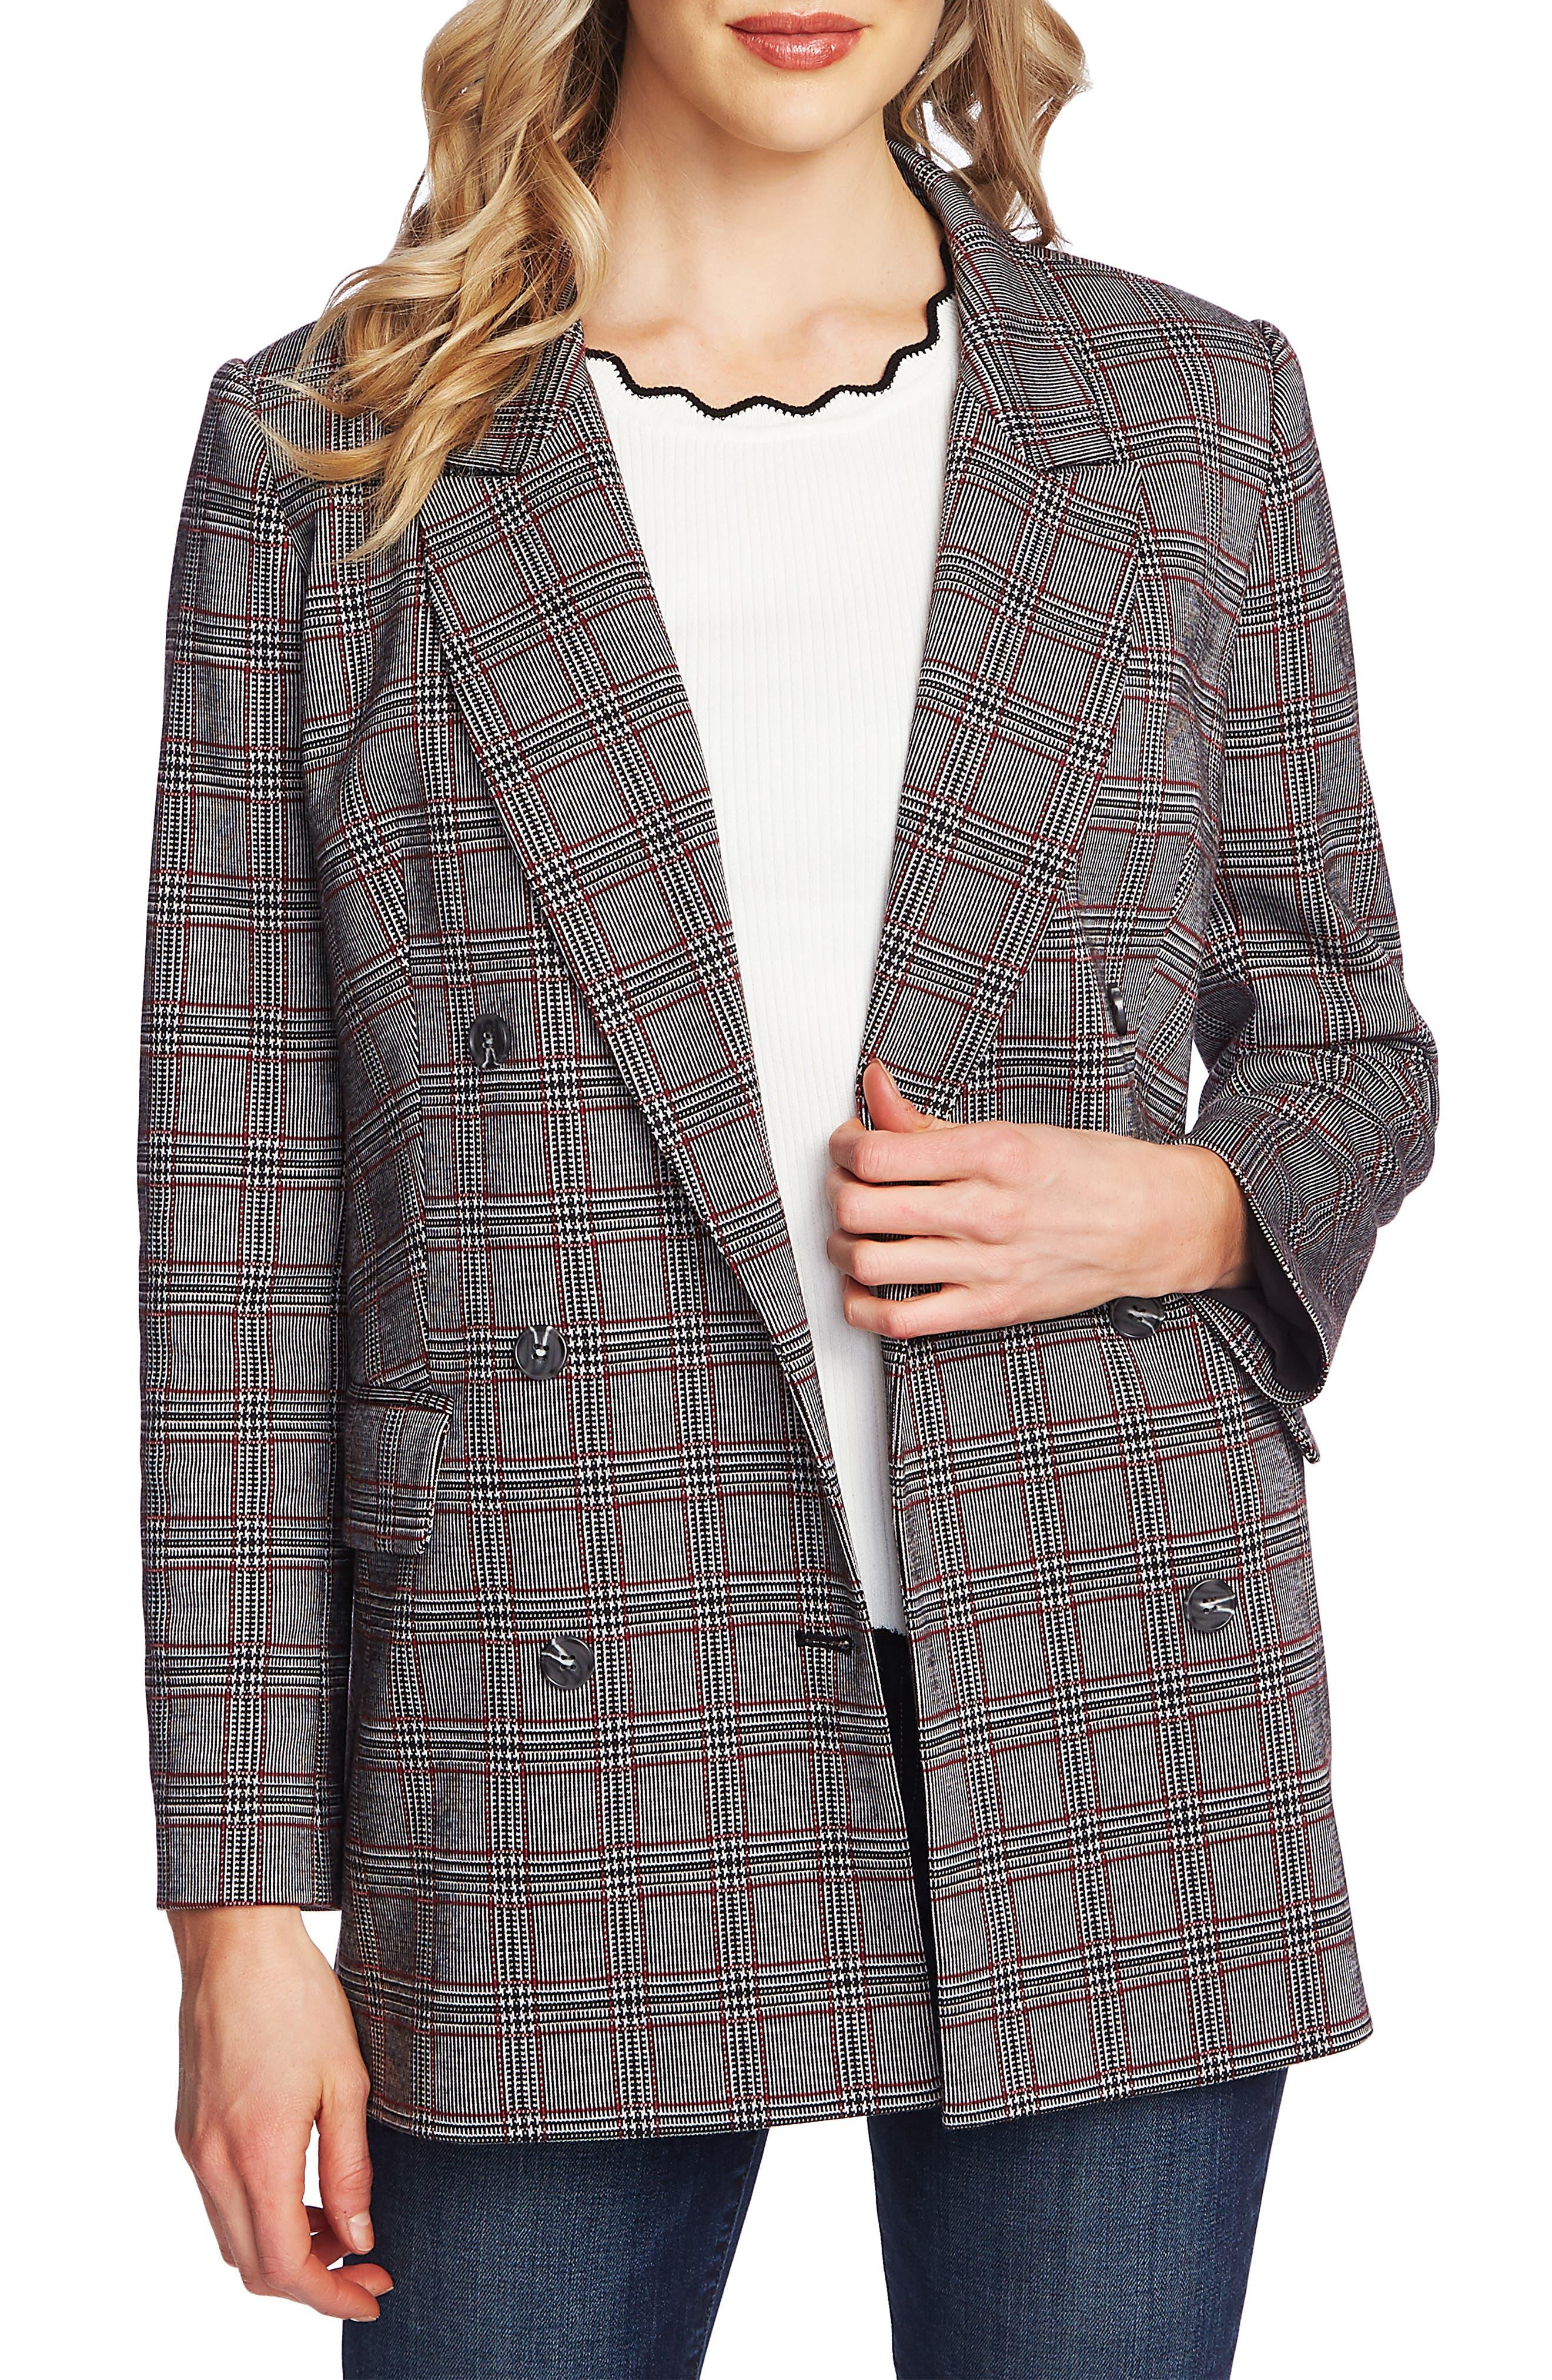 Vintage Coats & Jackets | Retro Coats and Jackets Womens Cece Menswear Plaid Oversize Blazer $159.00 AT vintagedancer.com